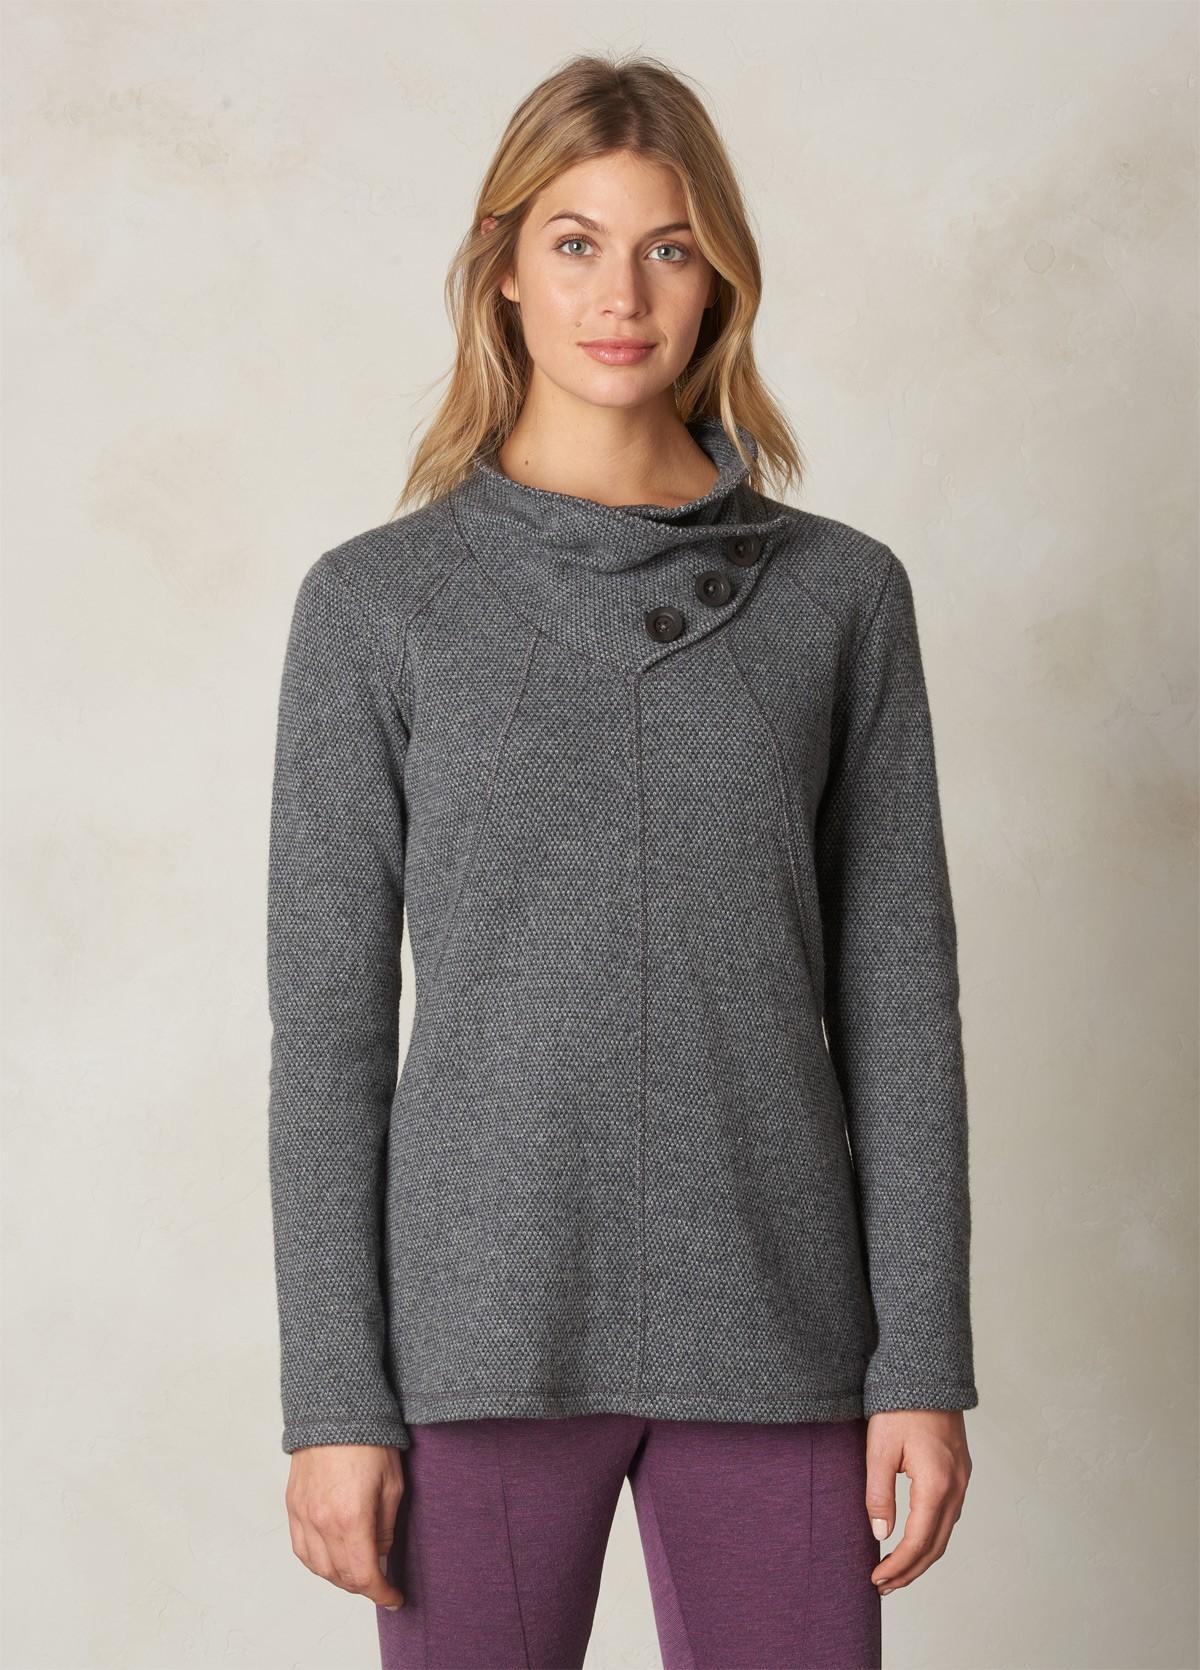 tunic sweater view larger image sgktydp